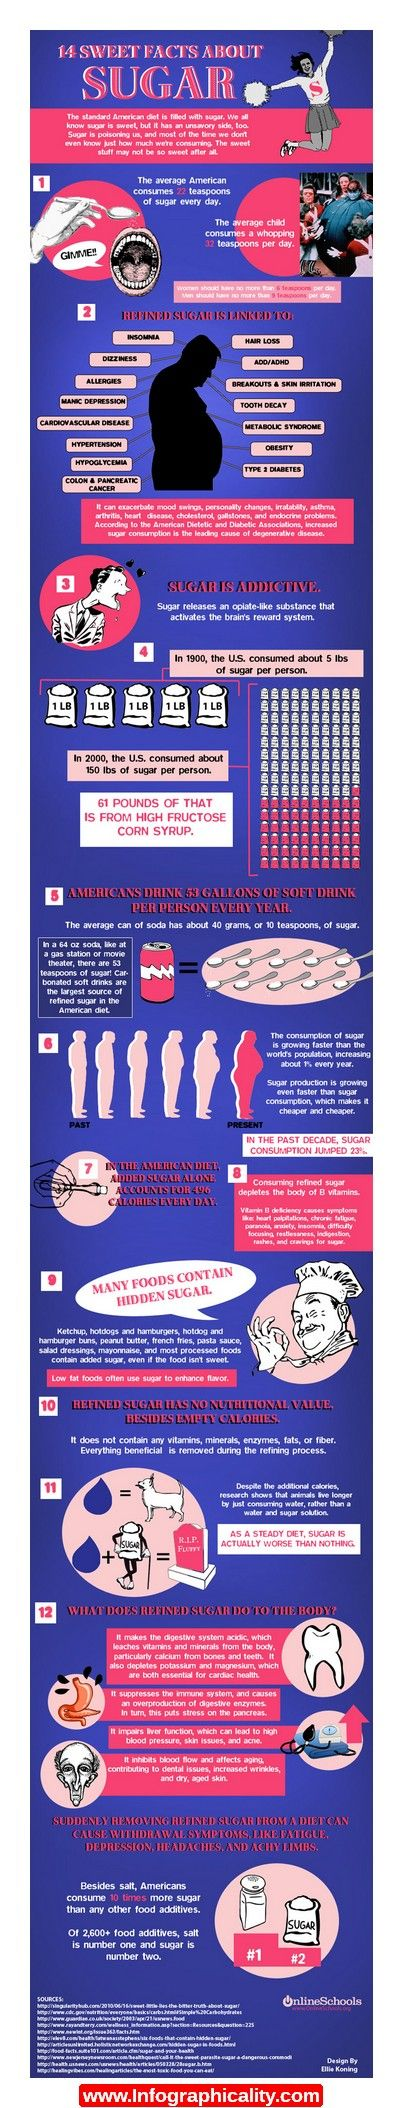 Sugar Infographic - http://infographicality.com/sugar-infographic/